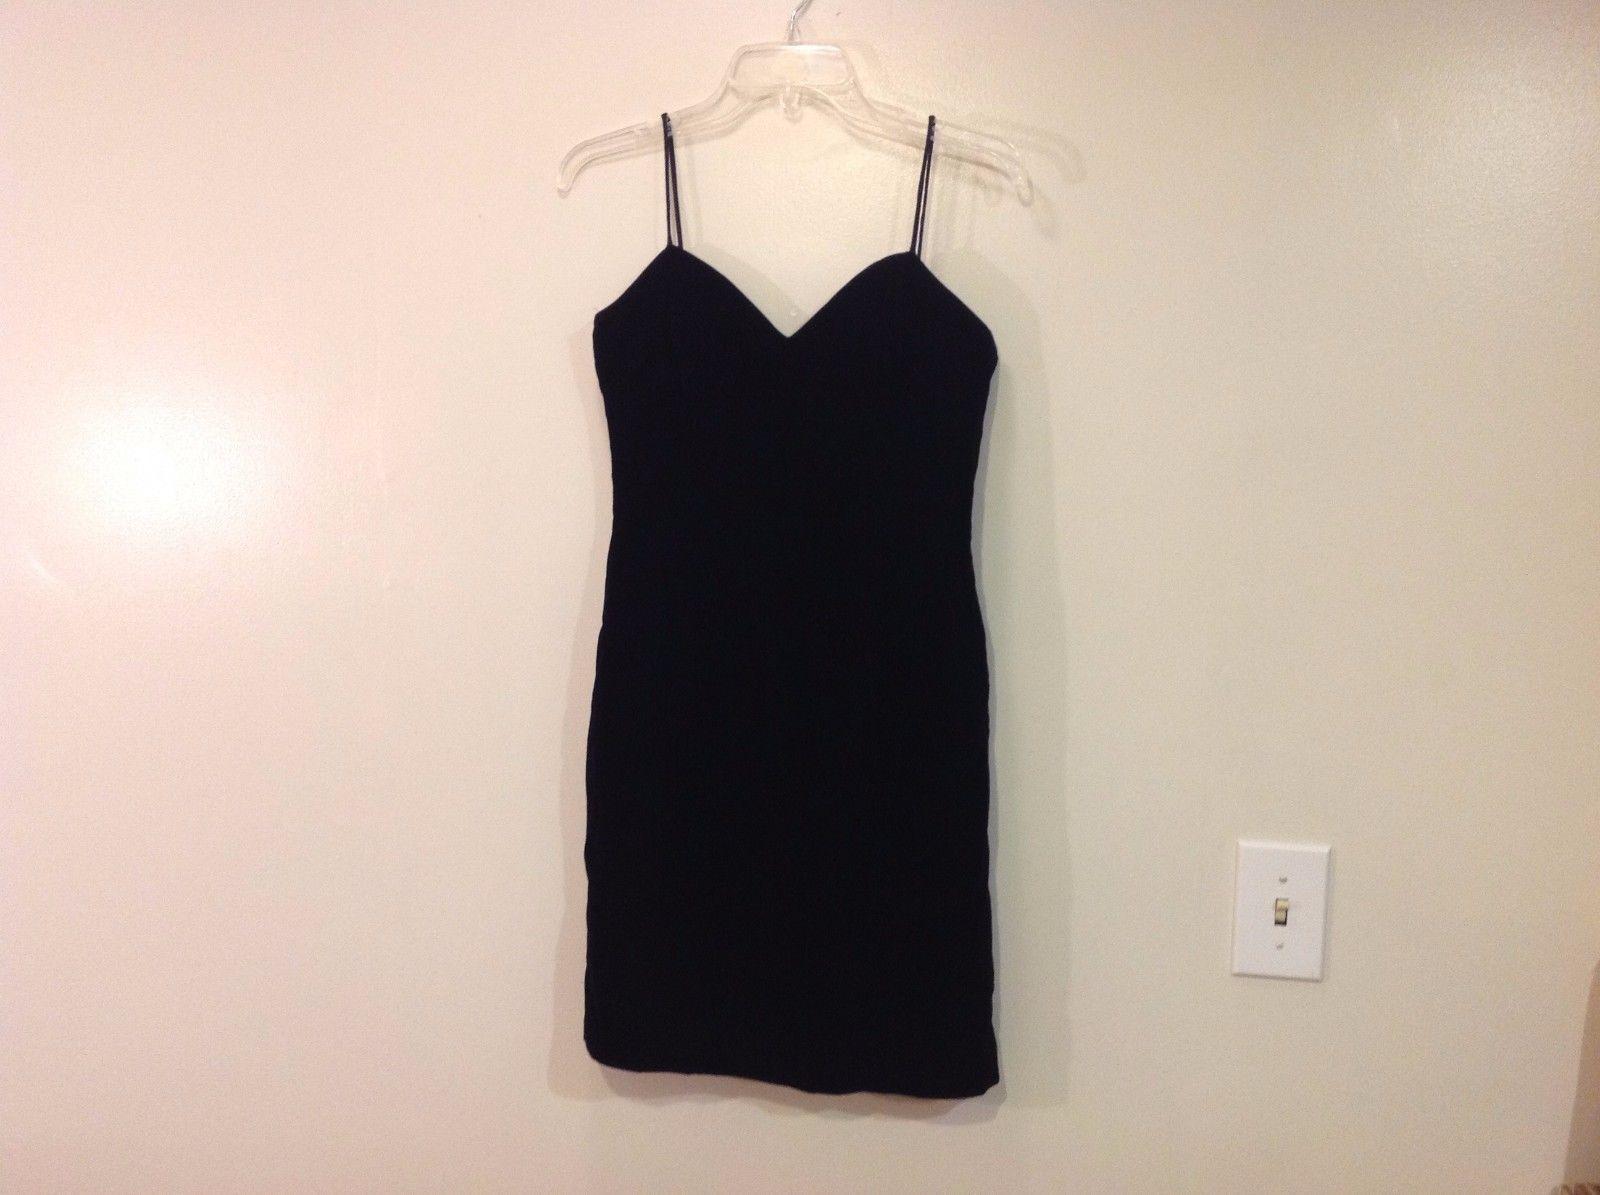 Little Black Velvet Evening Dress CDC Evening No Size Tage